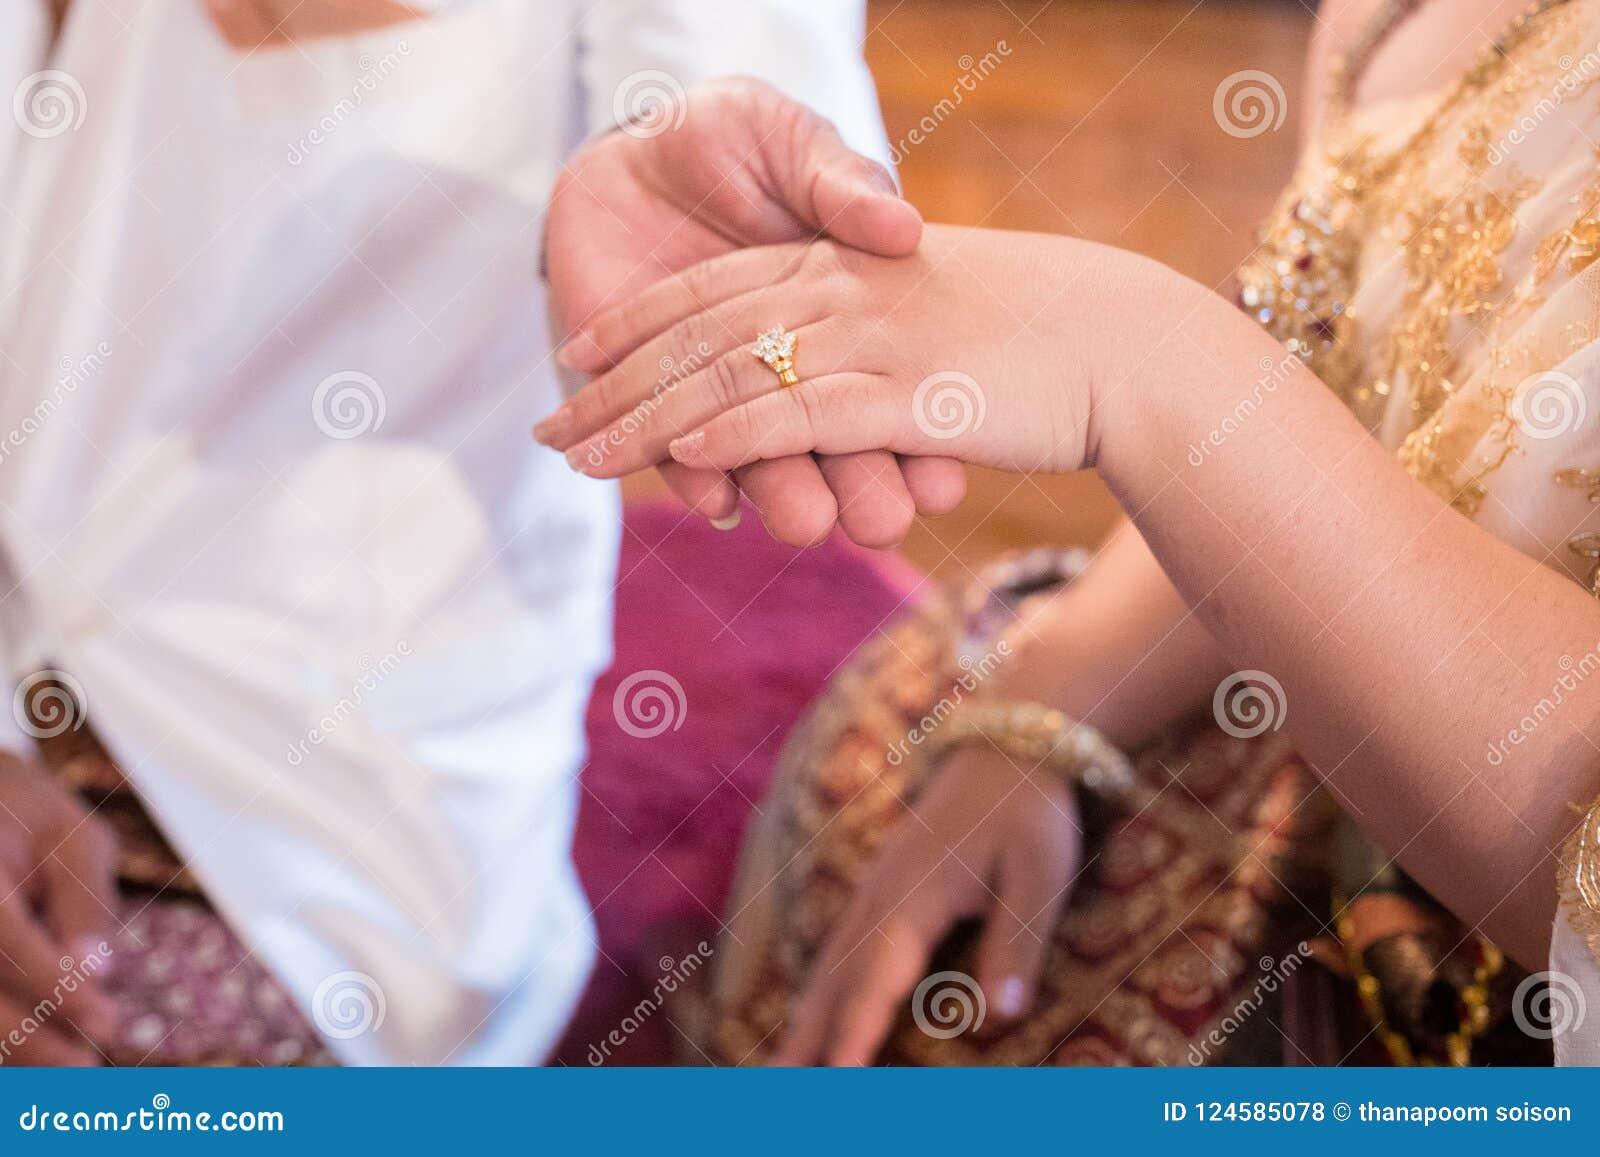 Couple Wear a ring stock photo. Image of beautiful, festive - 124585078